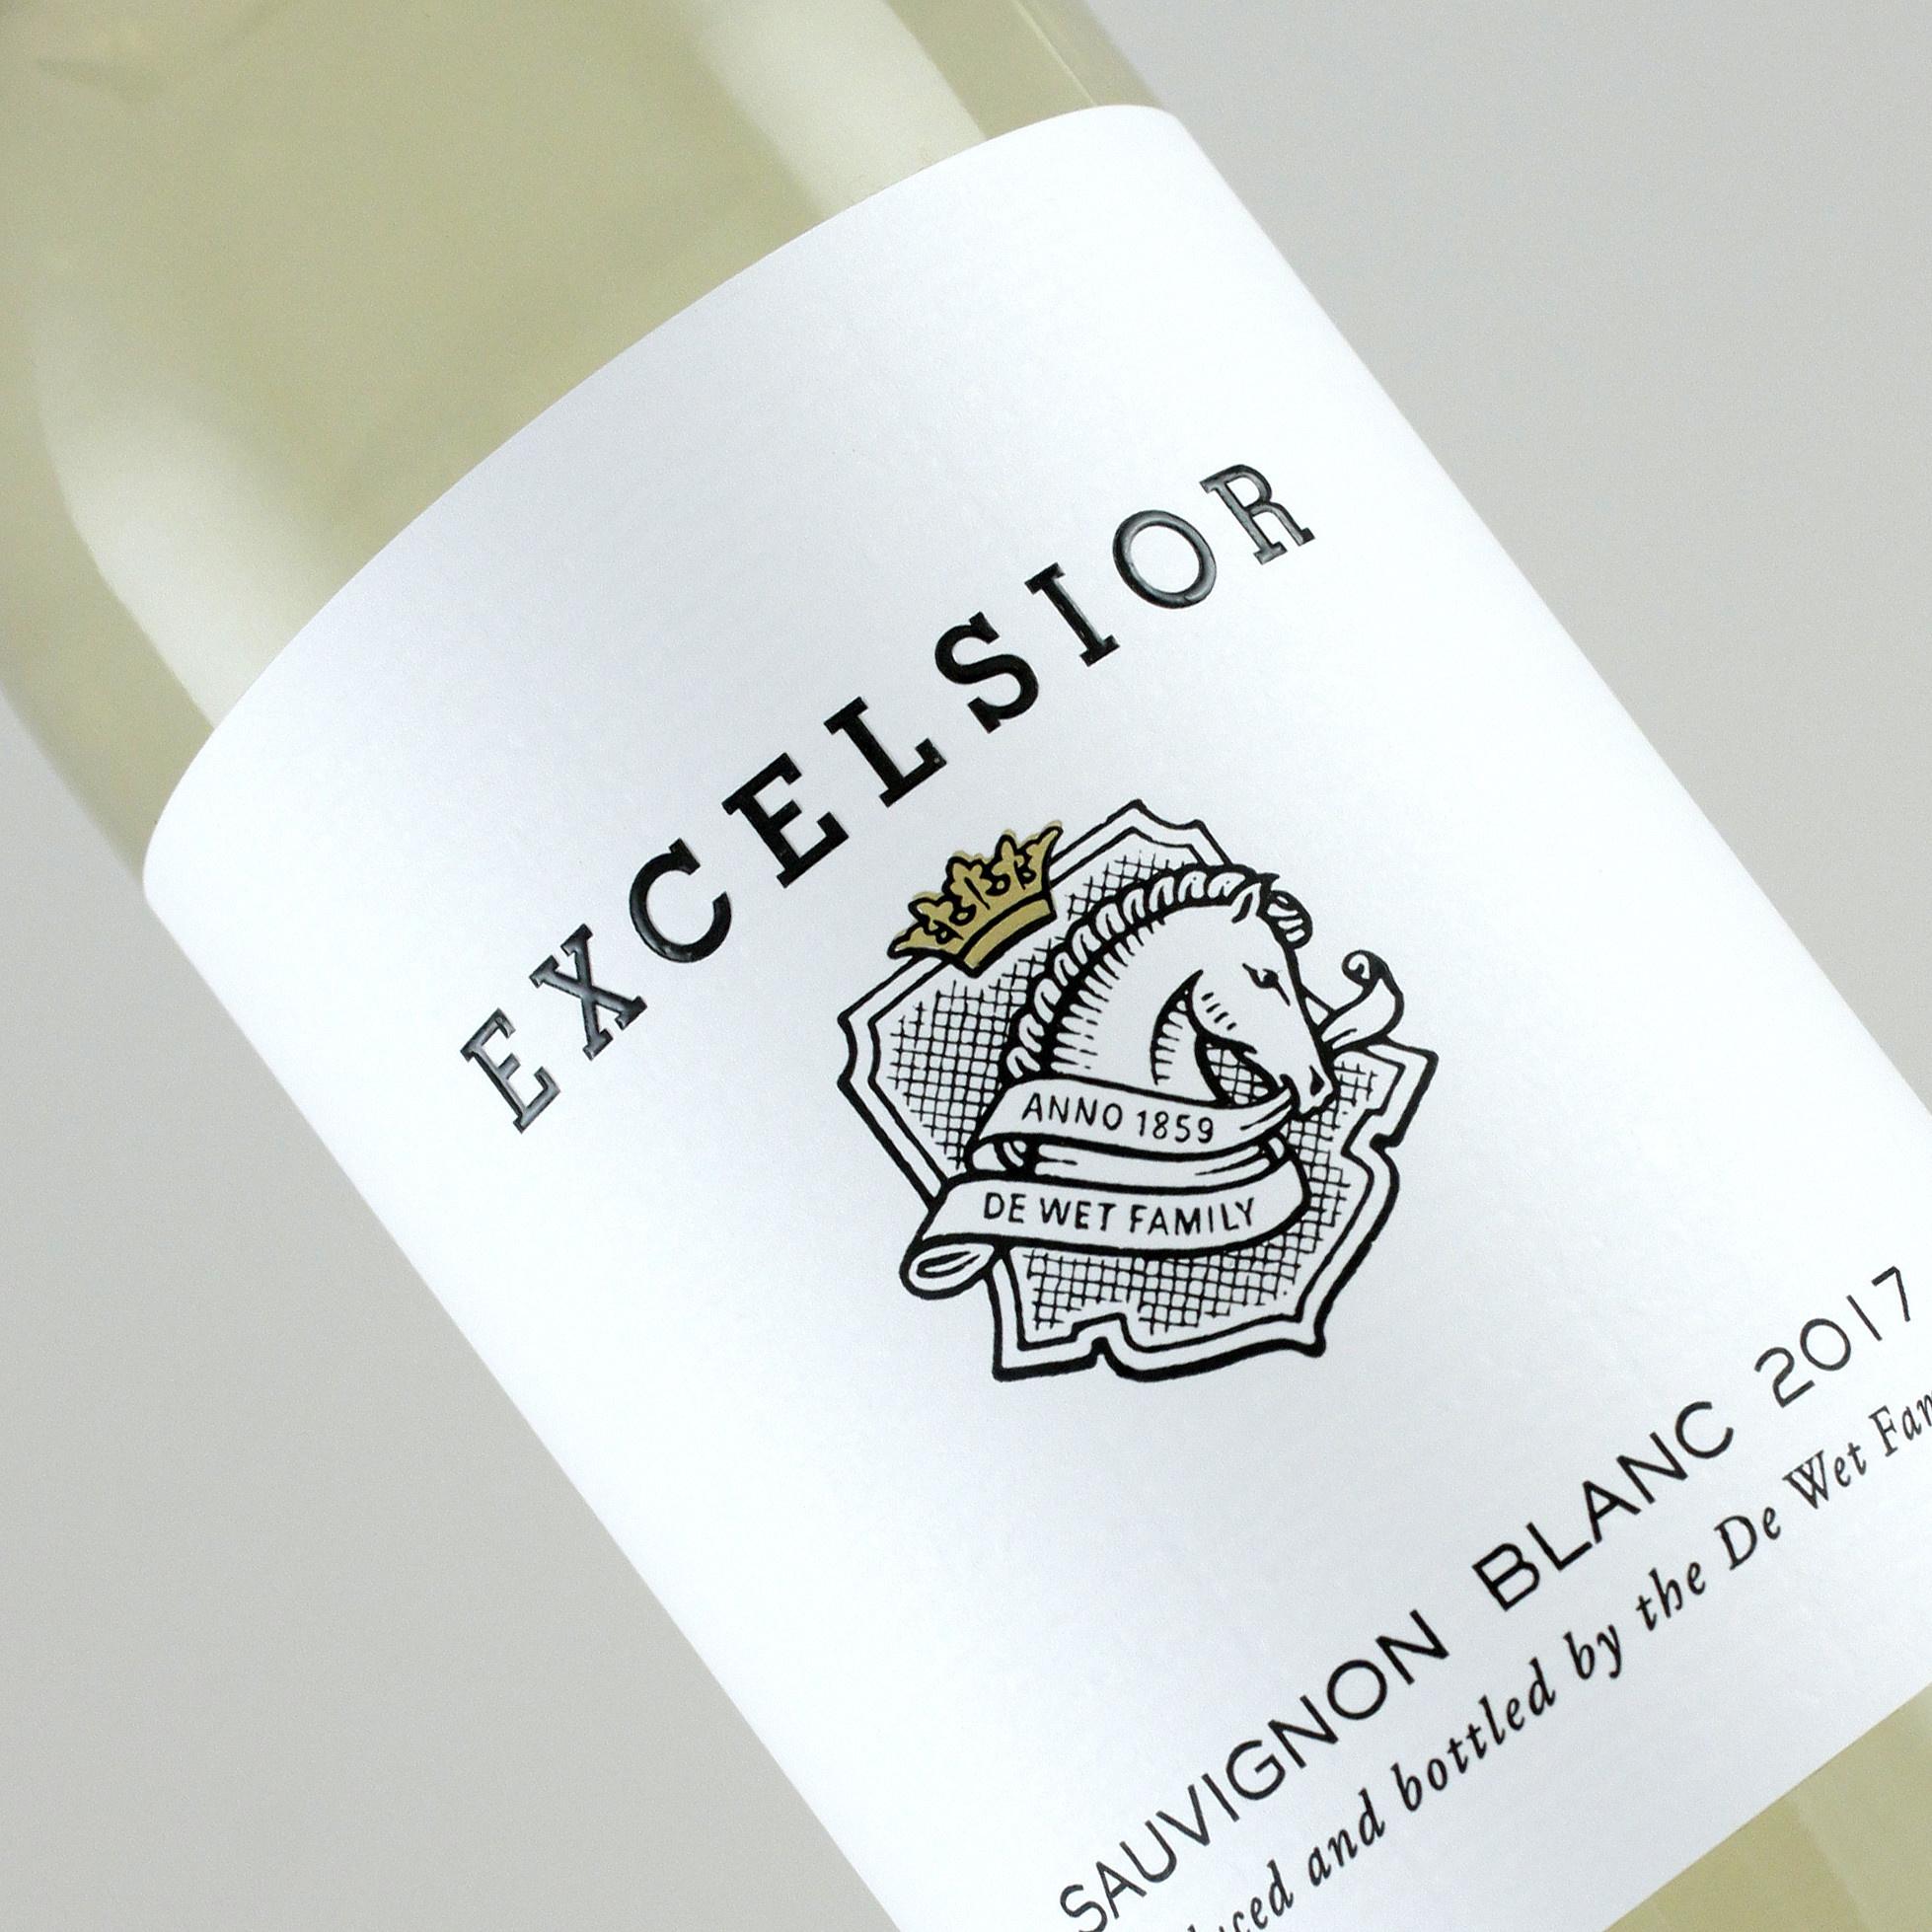 Excelsior Robertson 2017 Sauvignon Blanc, South Africa